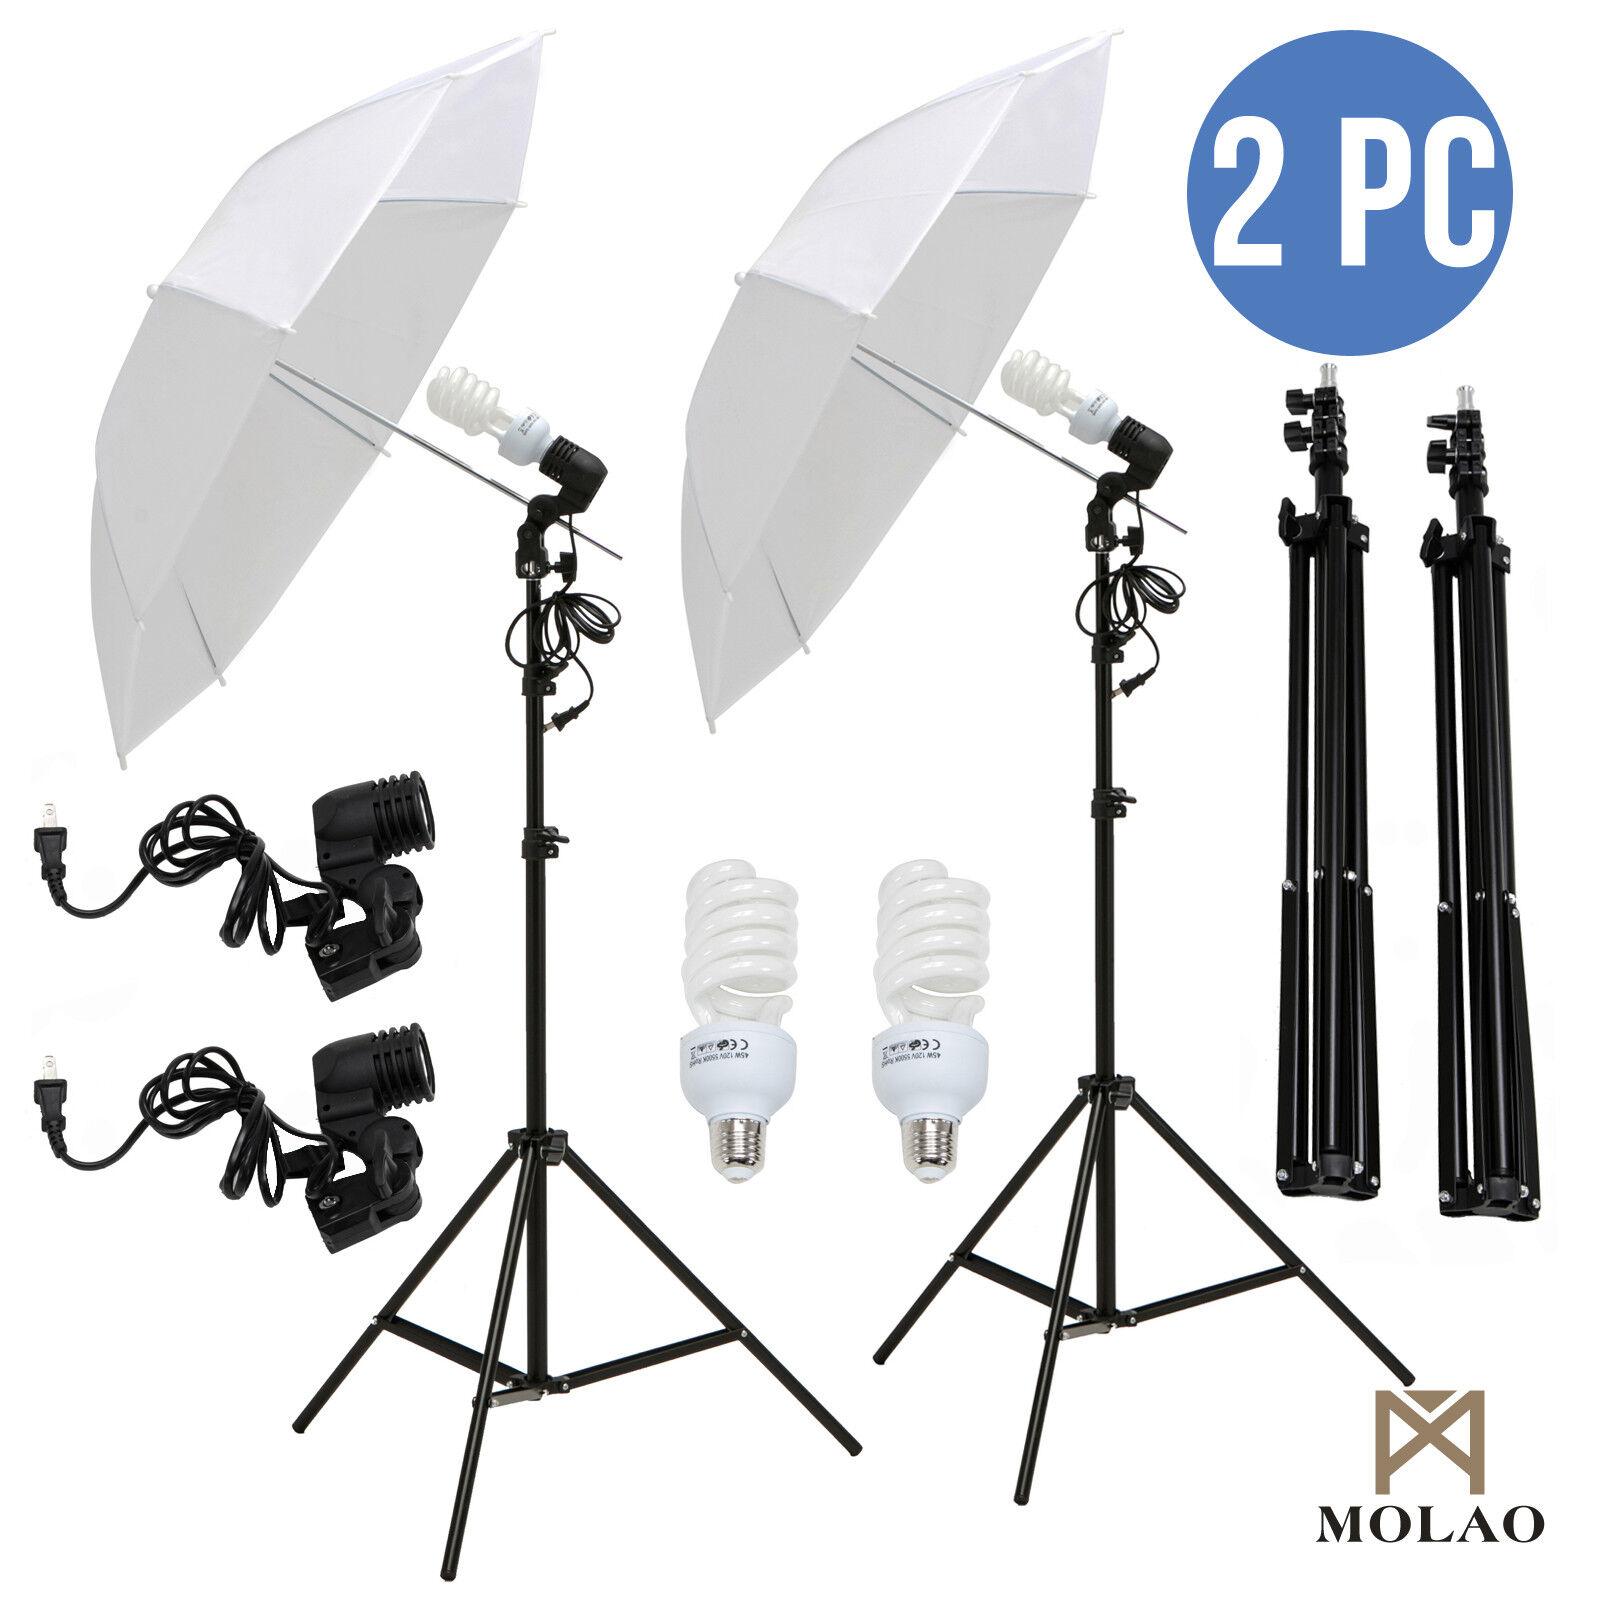 "2x33"" Photo Video Studio Umbrella Reflector Photography Stand Lighting Kit White -   10 - 2×33″ Photo Video Studio Umbrella Reflector Photography Stand Lighting Kit White"